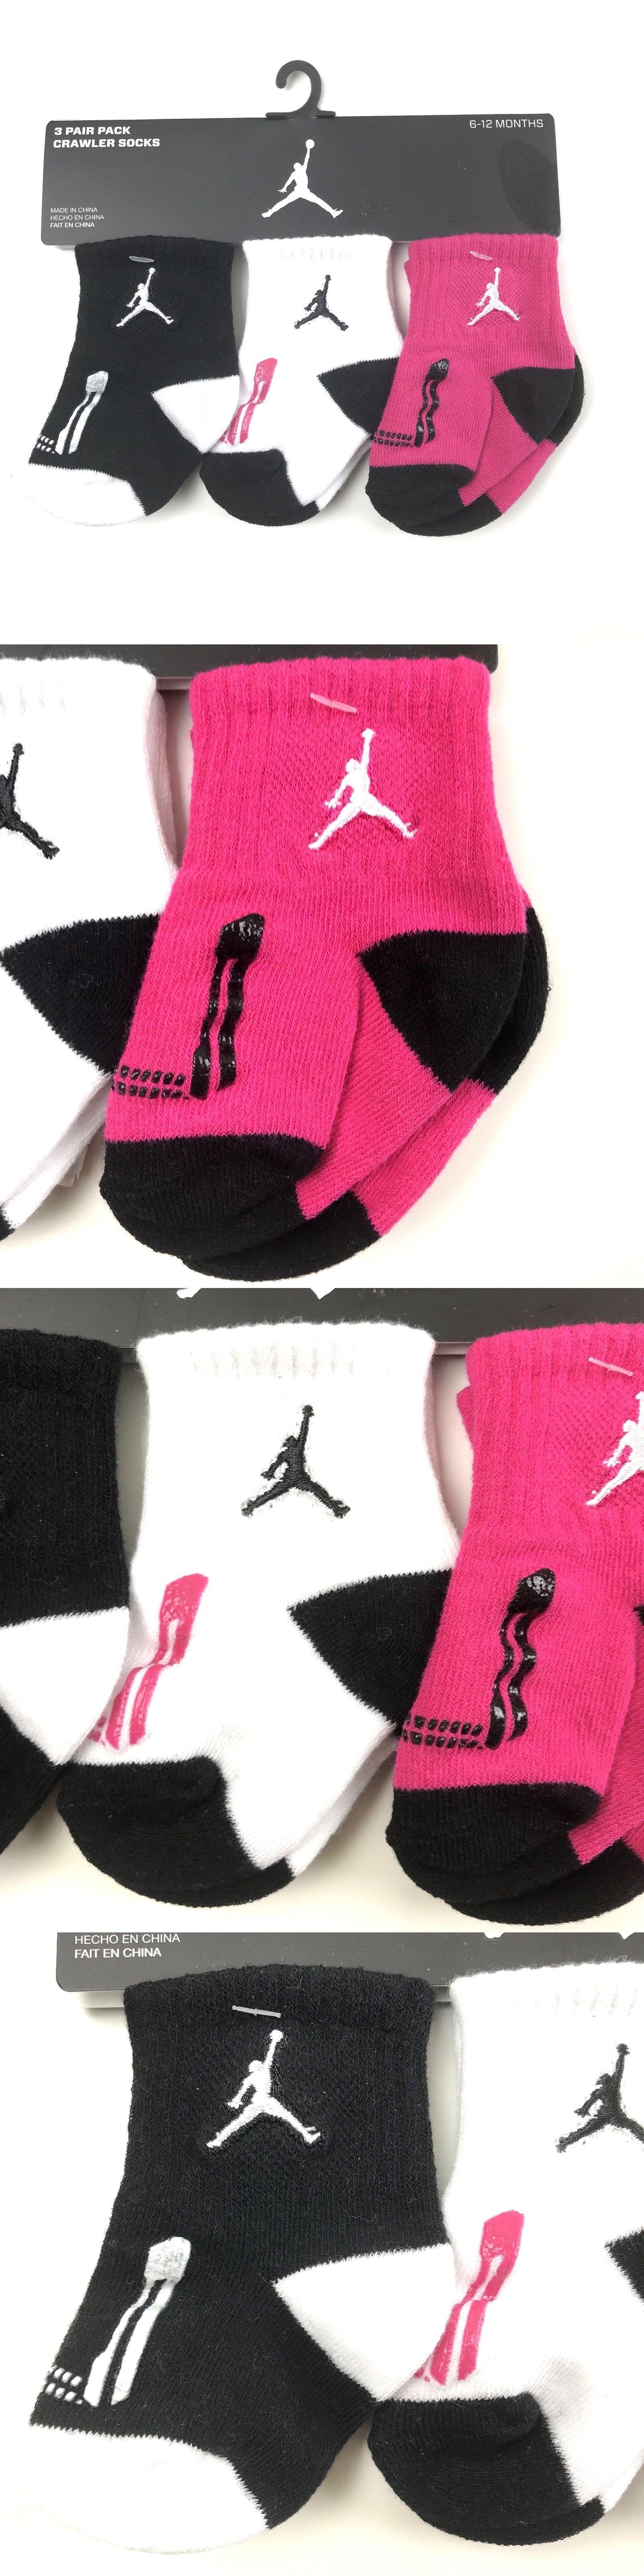 488aa47b4 Socks 57749: Nike 6-12 Mo Jordan Crawler Socks Set Black White Pink Jumpman  Baby Infant -> BUY IT NOW ONLY: $15.99 on #eBay #socks #jordan #crawler  #black ...